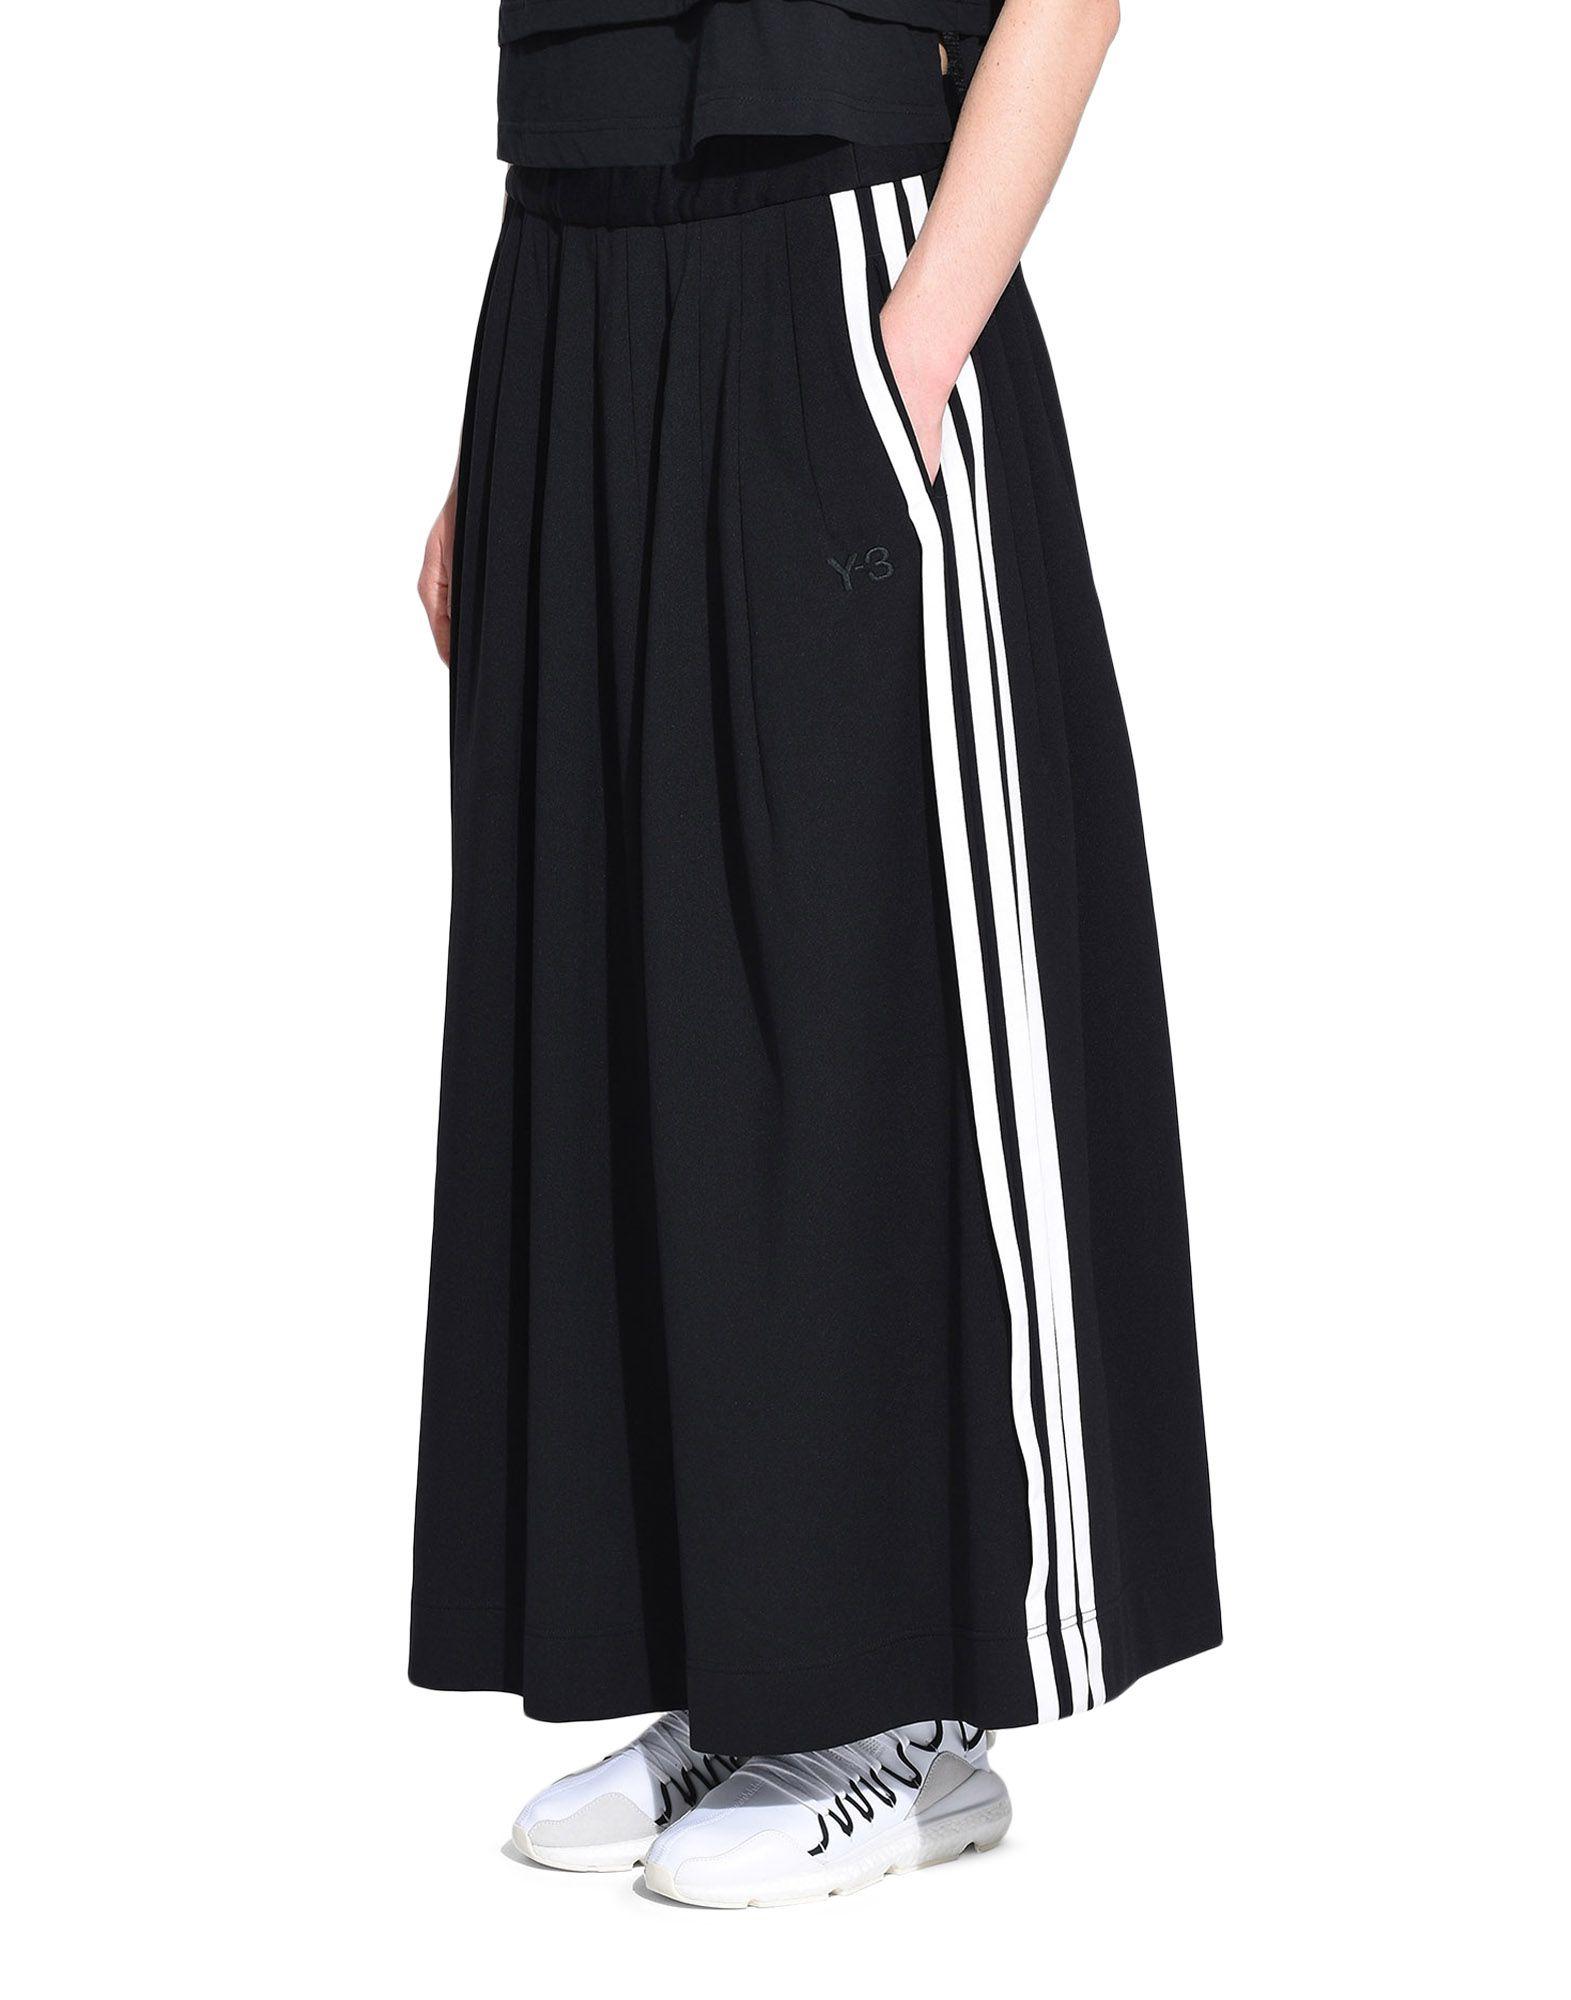 Y-3 Y-3 3-Stripes Selvedge Matte Track Skirt Юбка до колена Для Женщин e